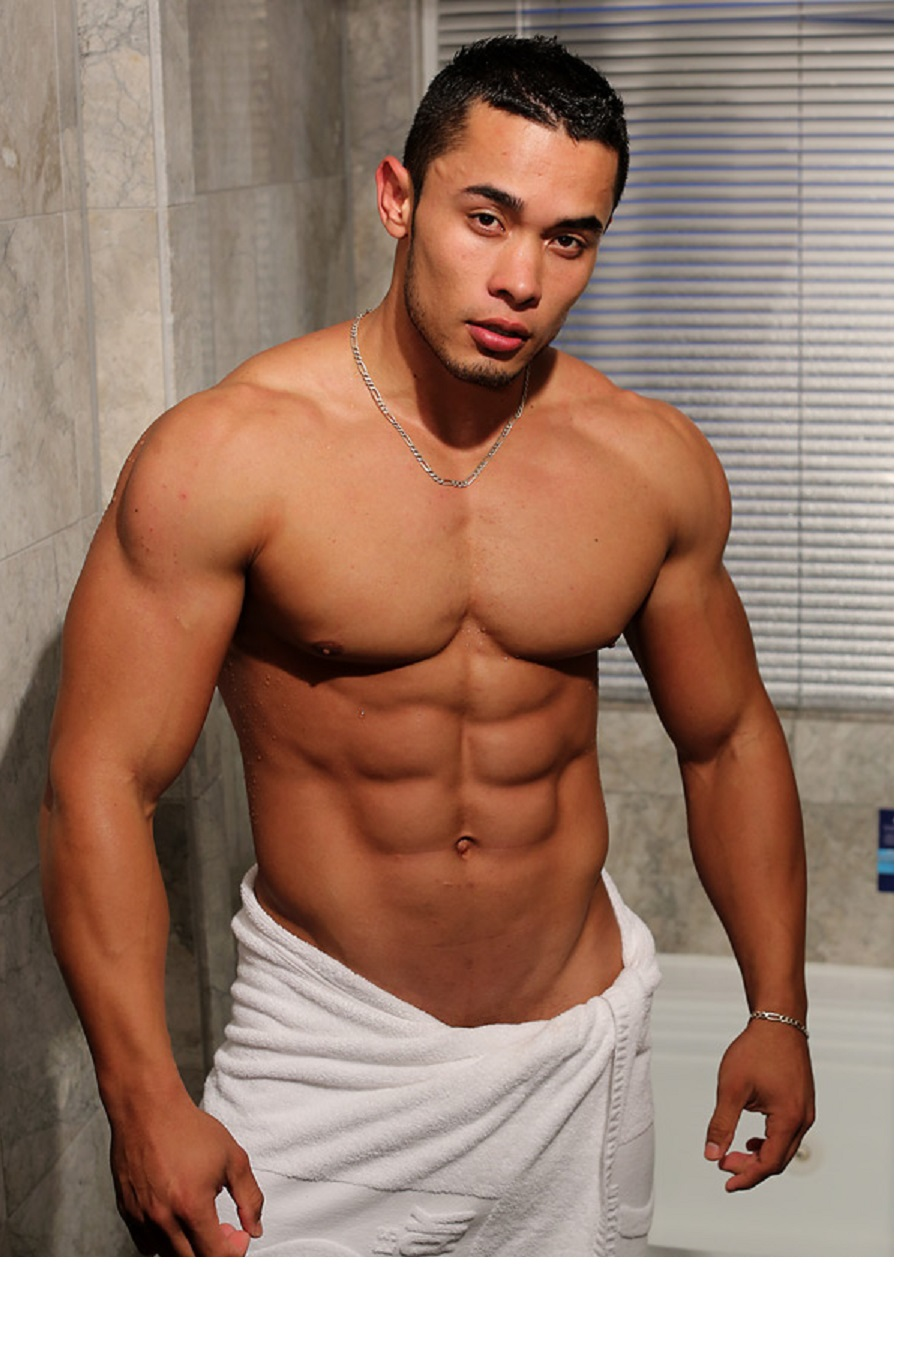 Sportsman Bulge Naked : Erection Bodybuilder